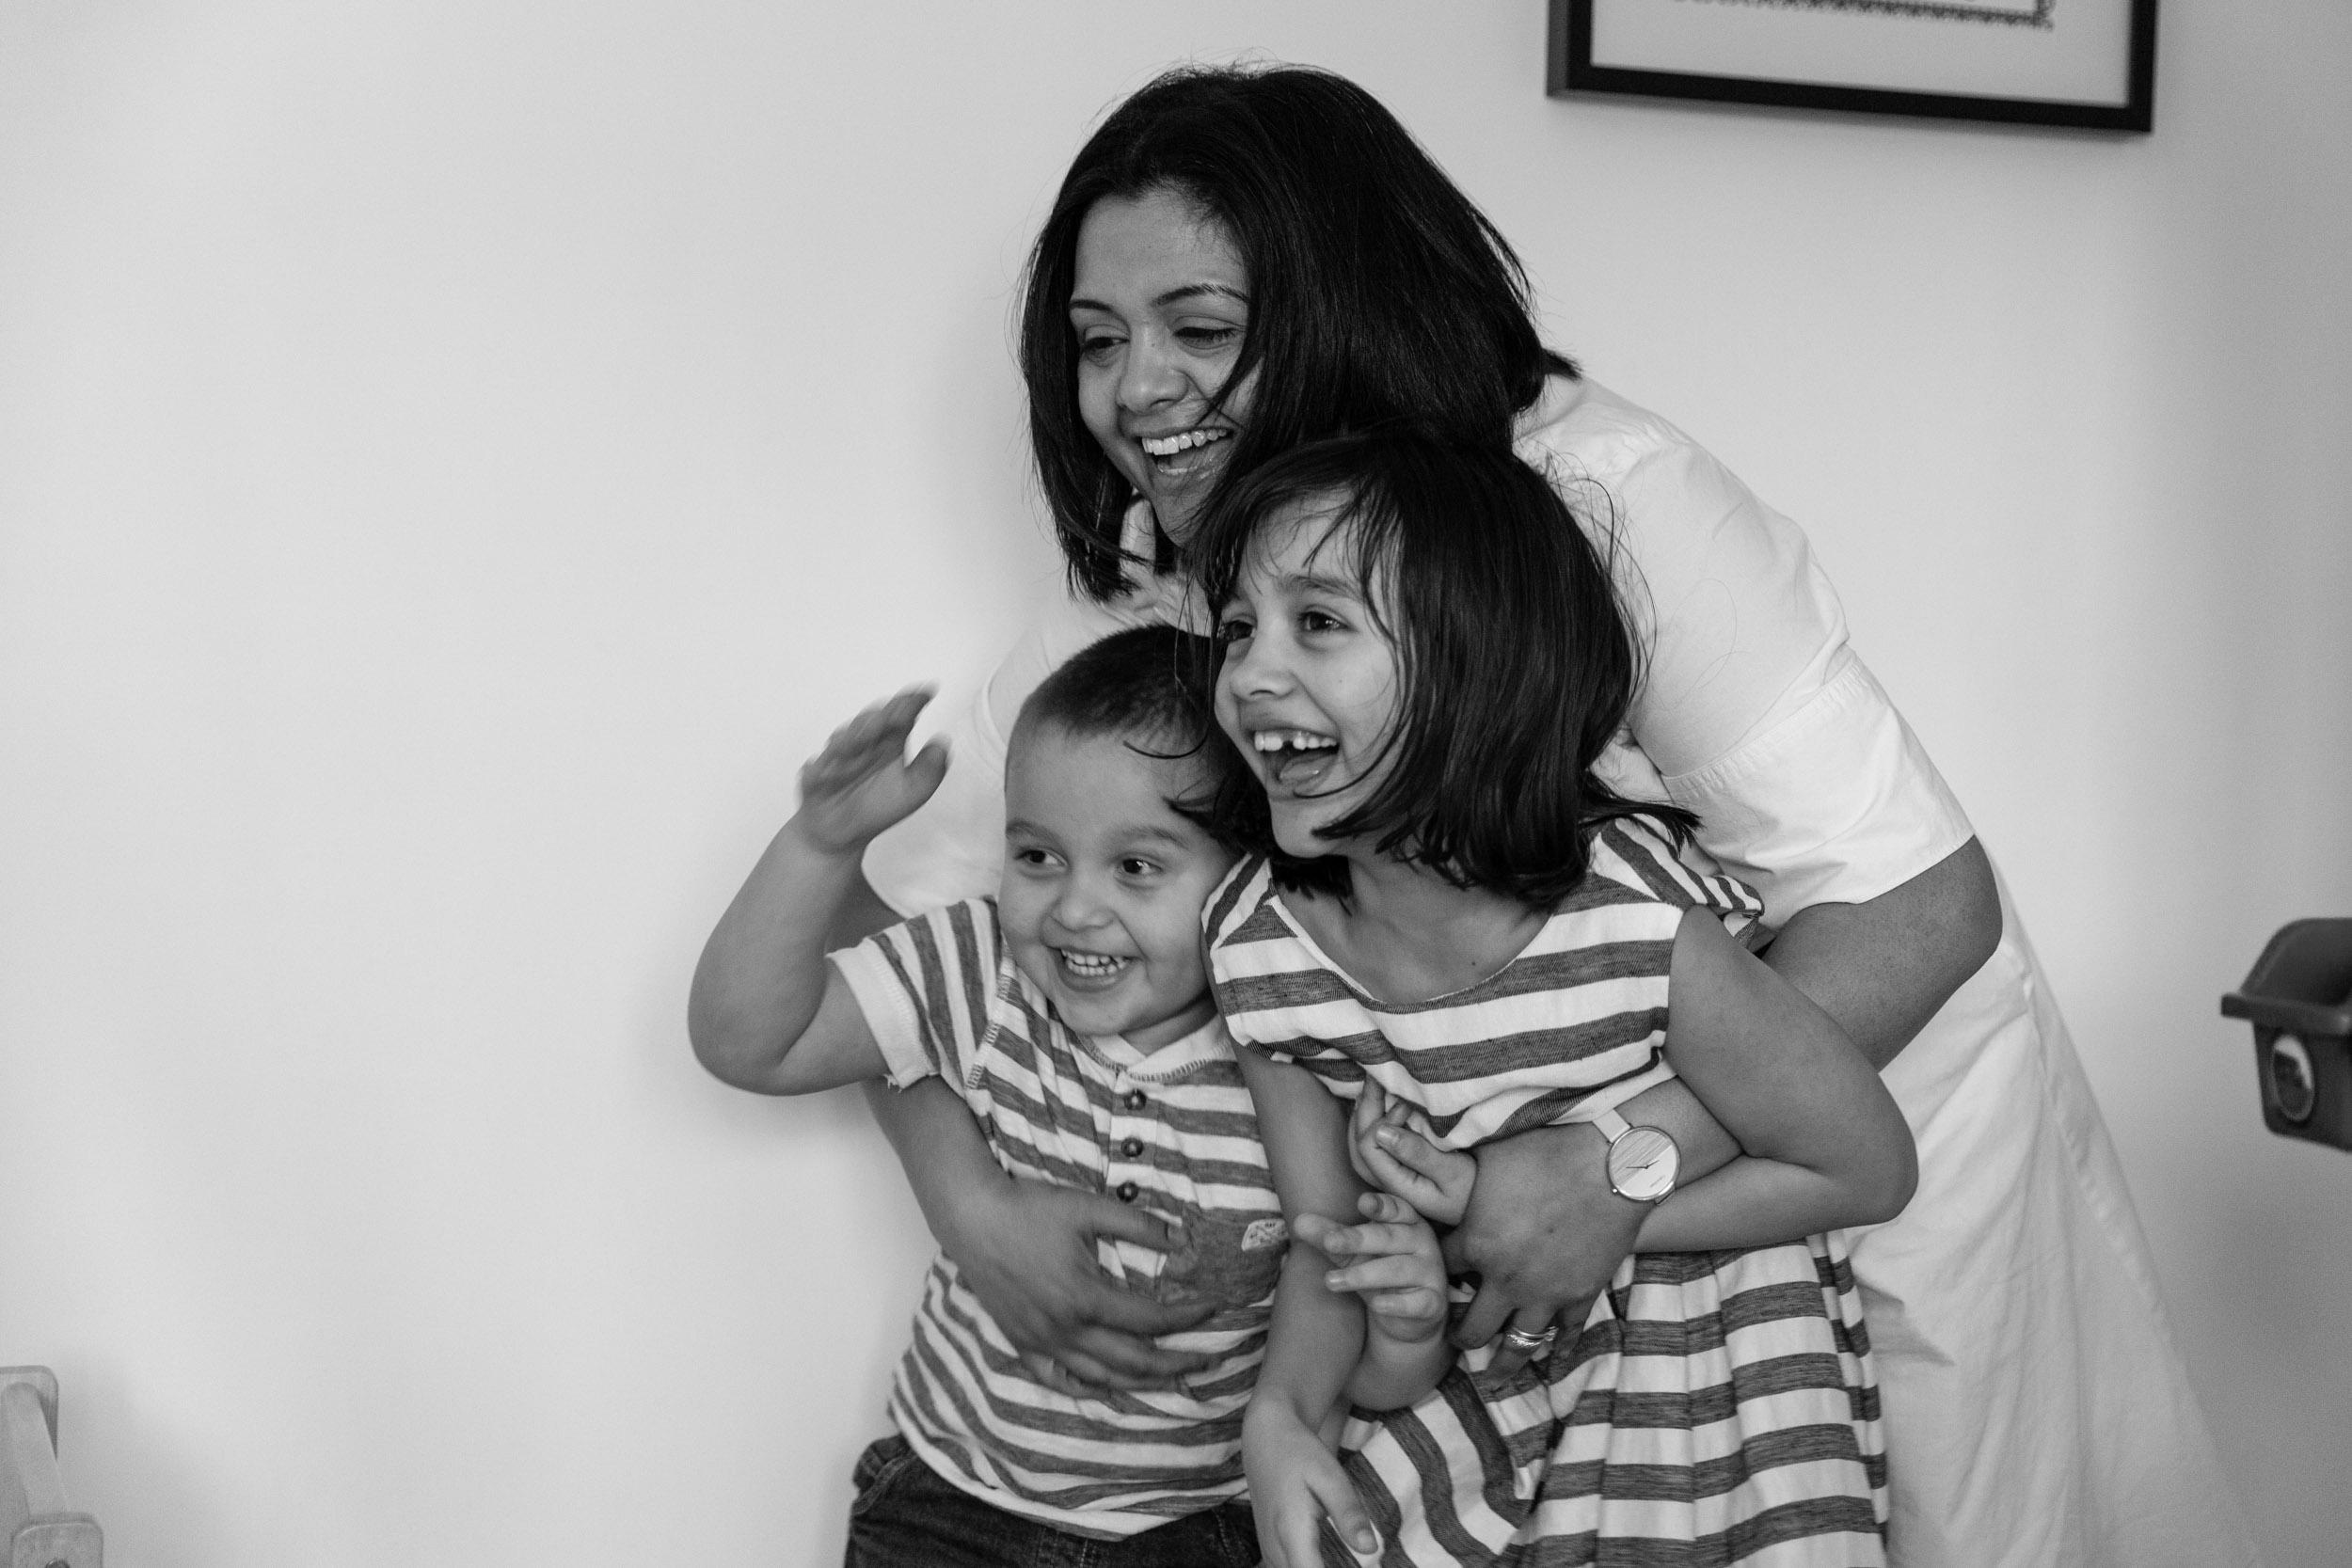 richmond-upon-thames children photographer-3.jpg